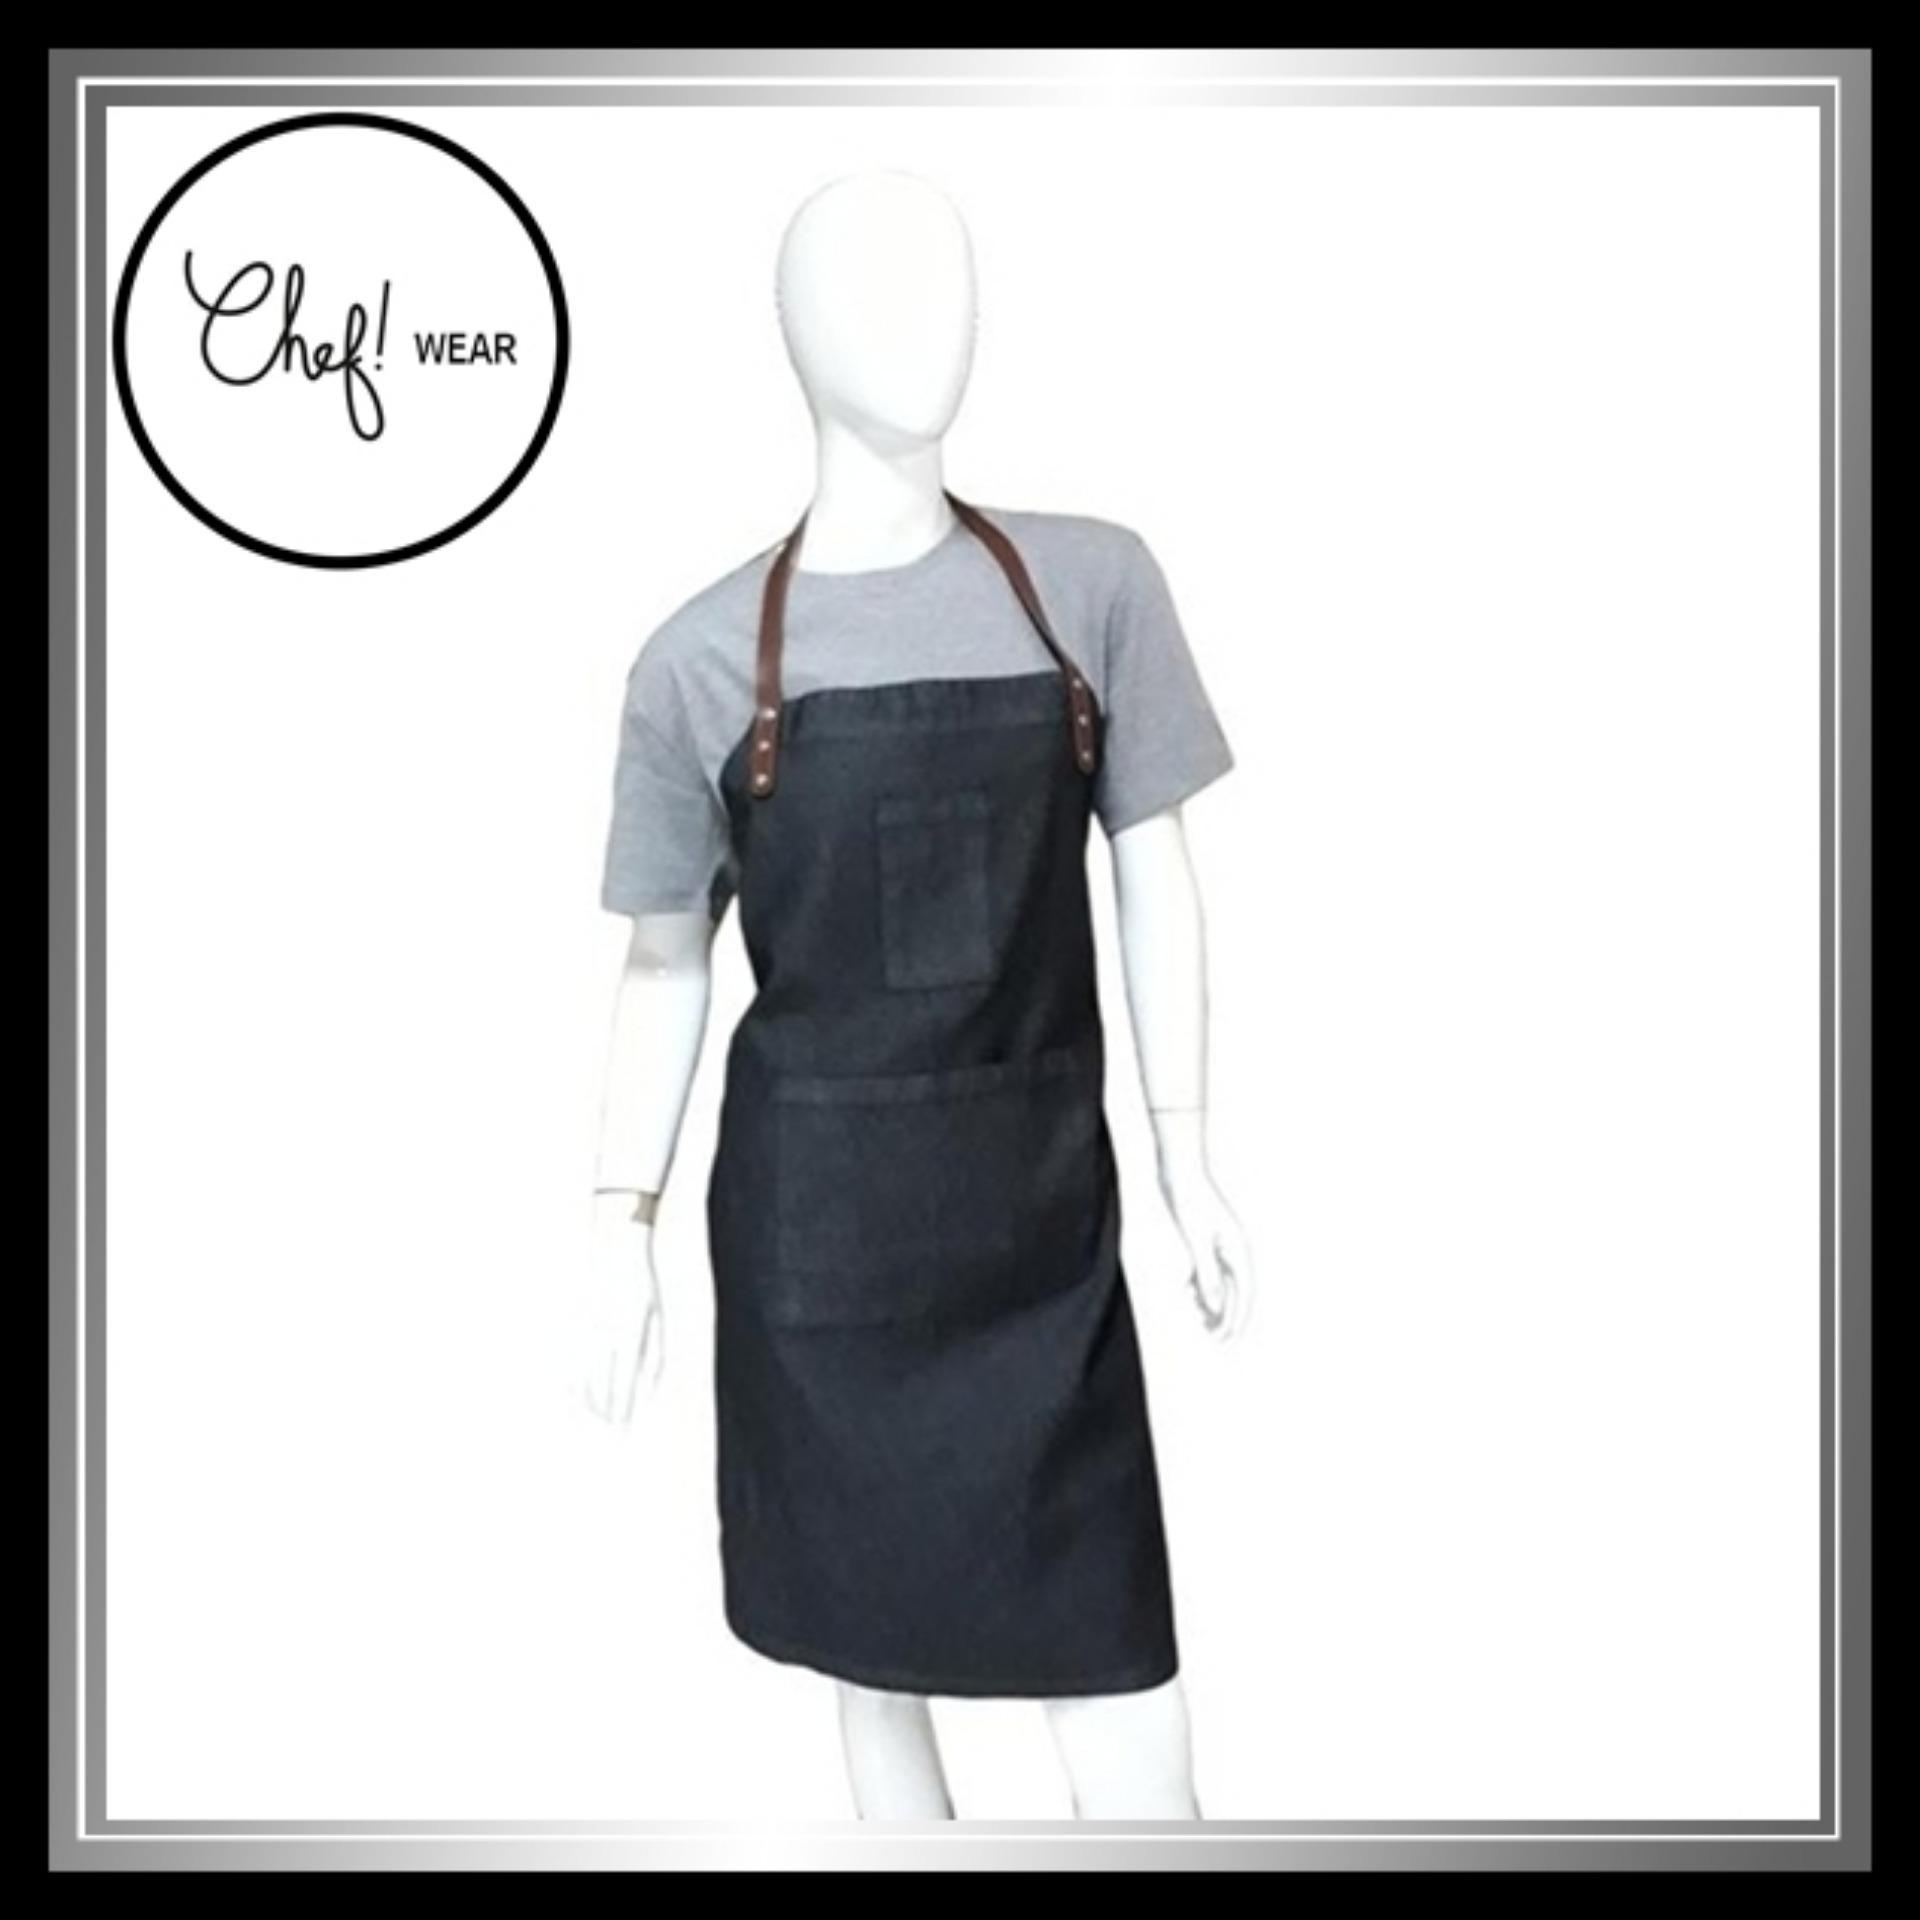 Jual Chef Wear Apron Celemek Denim Tali Kulit Kc Chef Wear Online